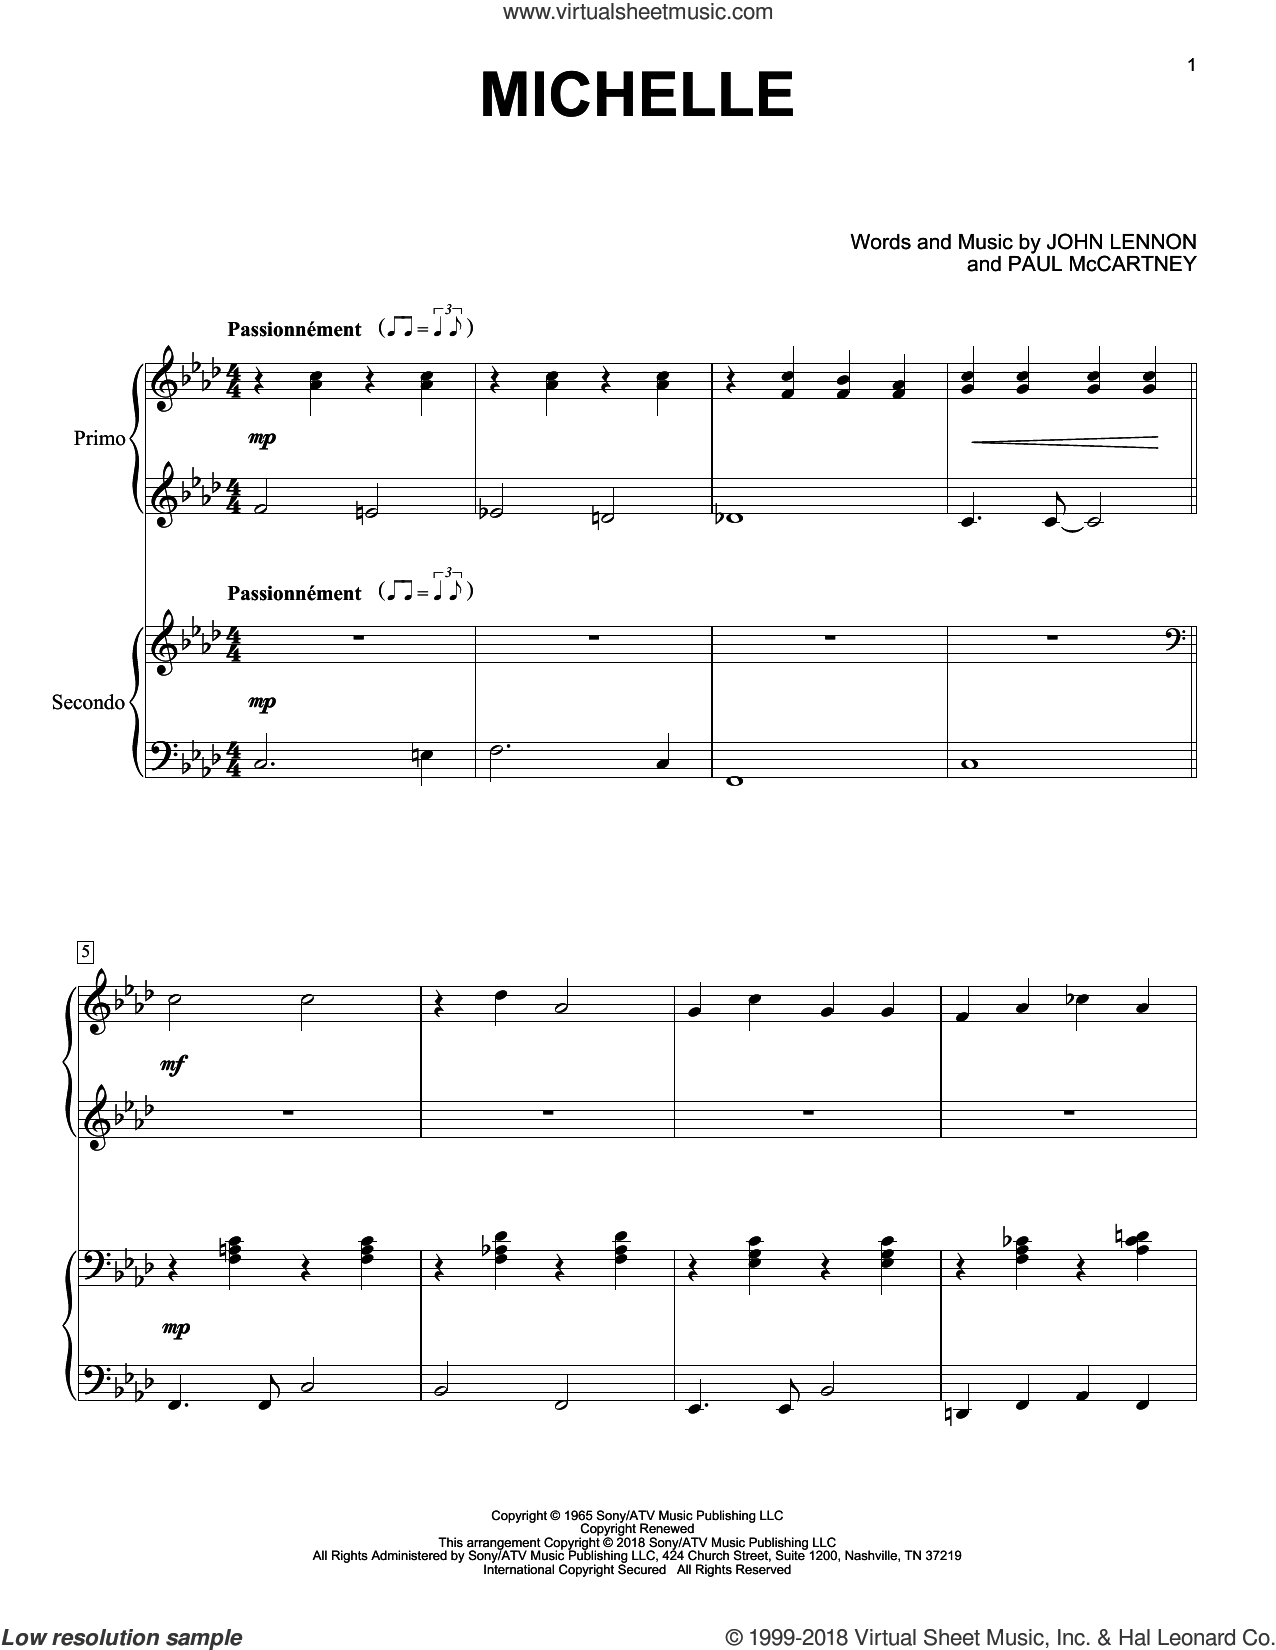 Michelle sheet music for piano four hands by The Beatles, Eric Baumgartner, John Lennon and Paul McCartney, intermediate skill level